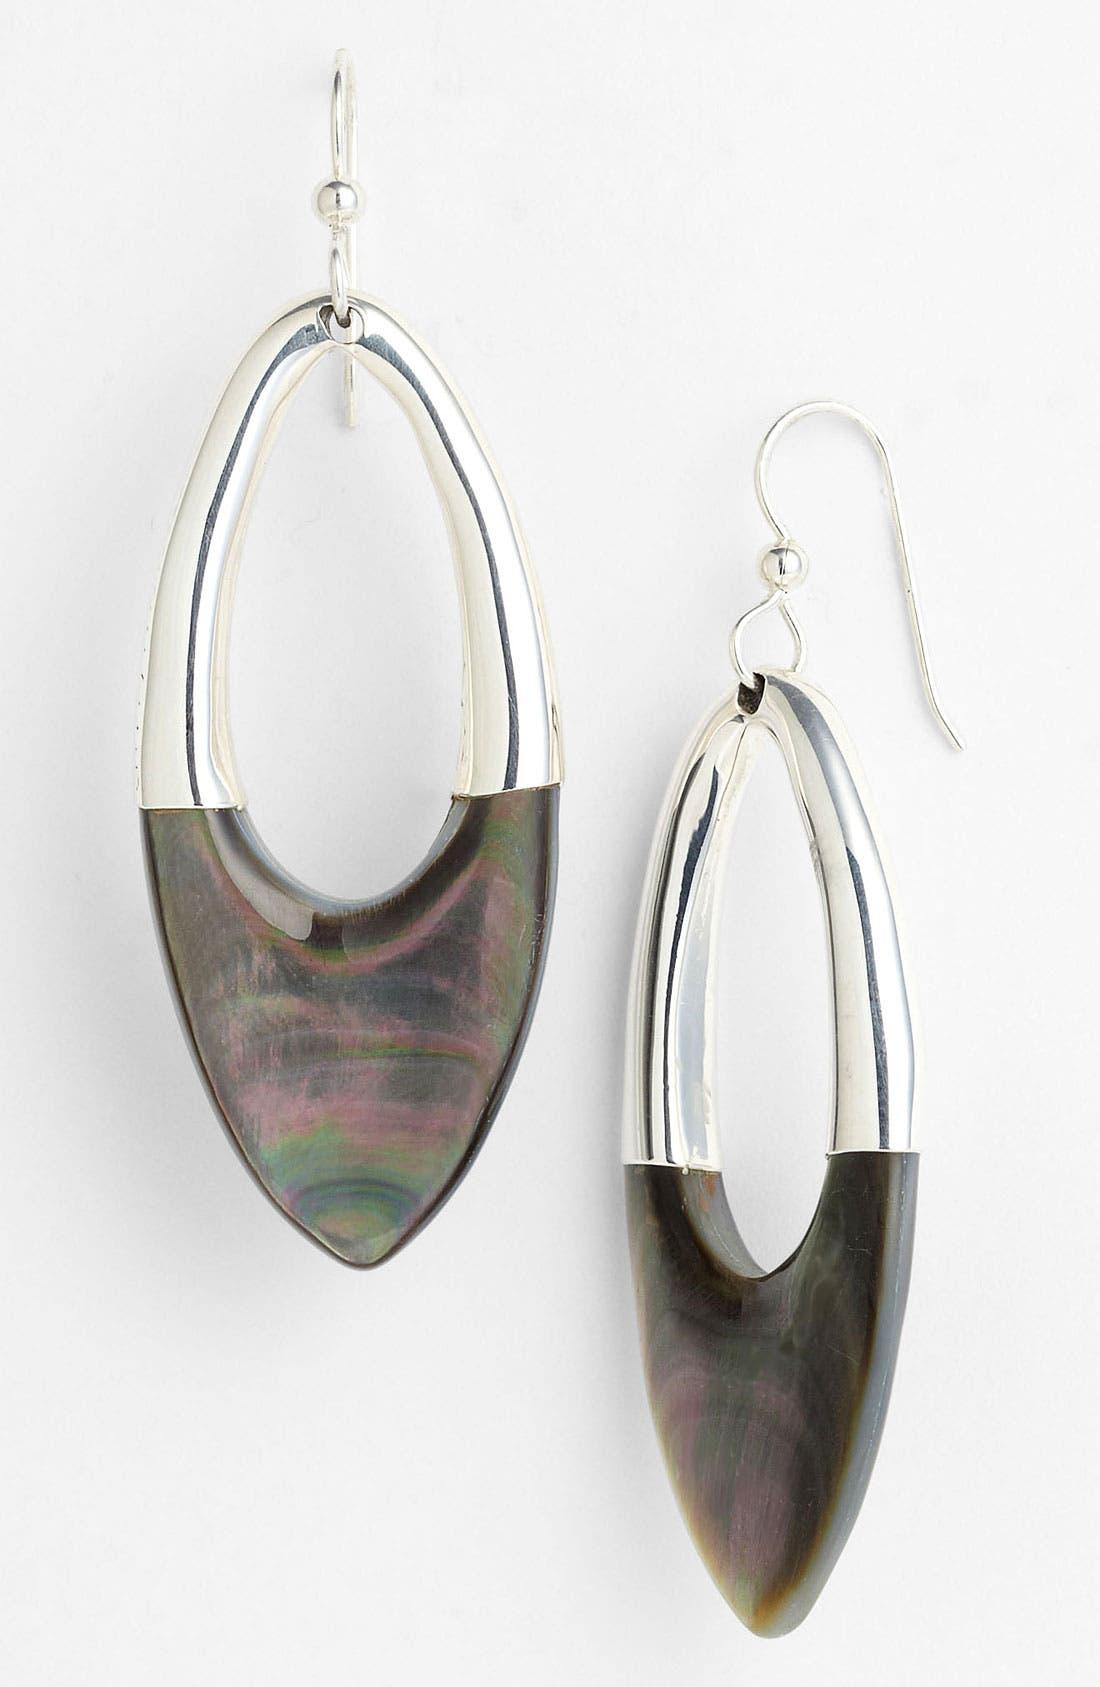 Alternate Image 1 Selected - Simon Sebbag 'Tahiti' Frontal Oval Hoop Earrings